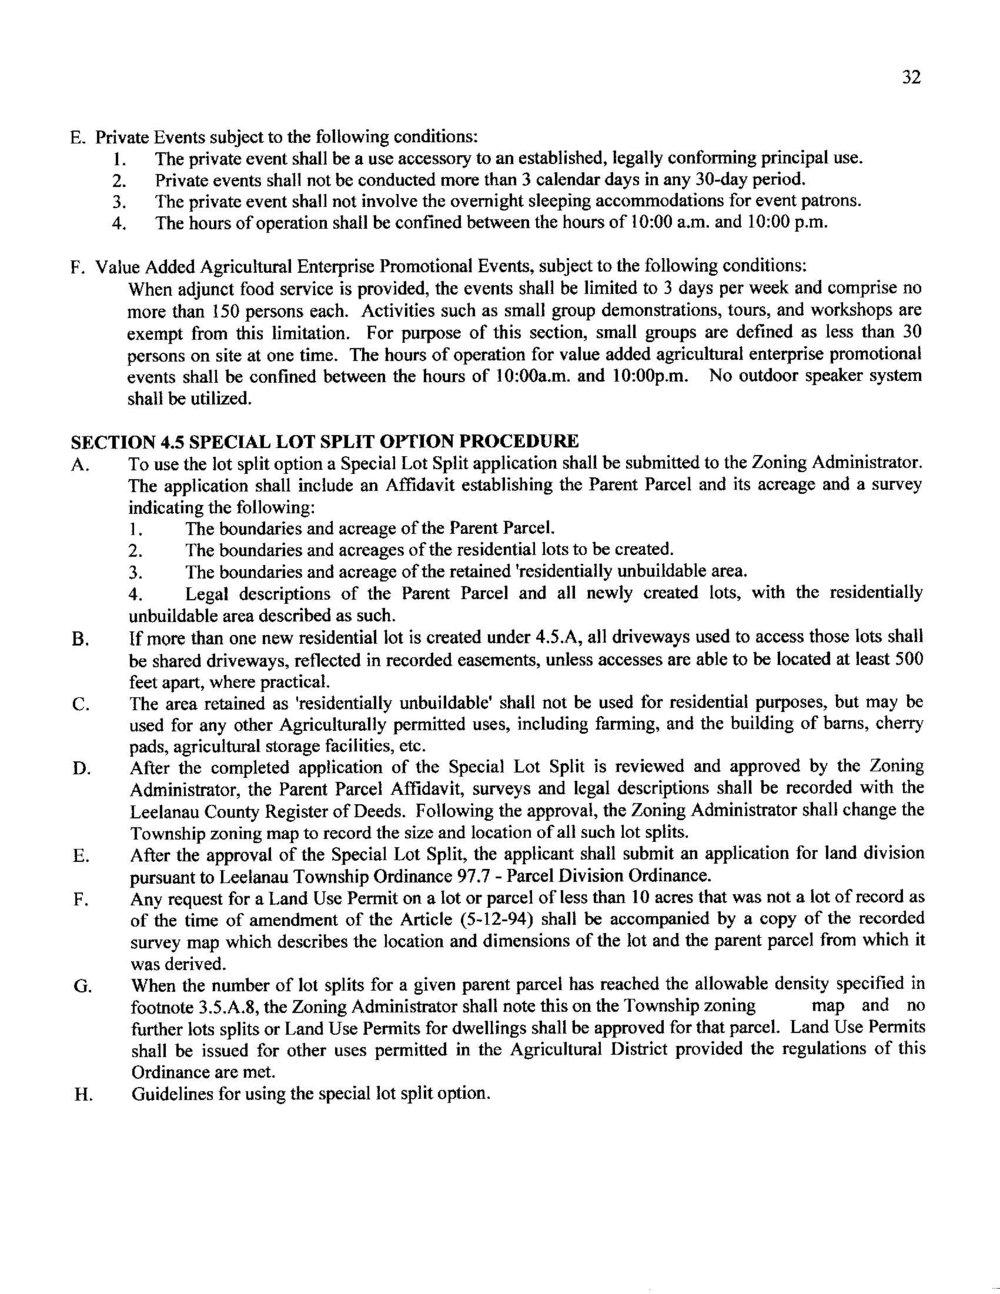 11140 E Lee Mann Road Marketing Packet_Page_24.jpg